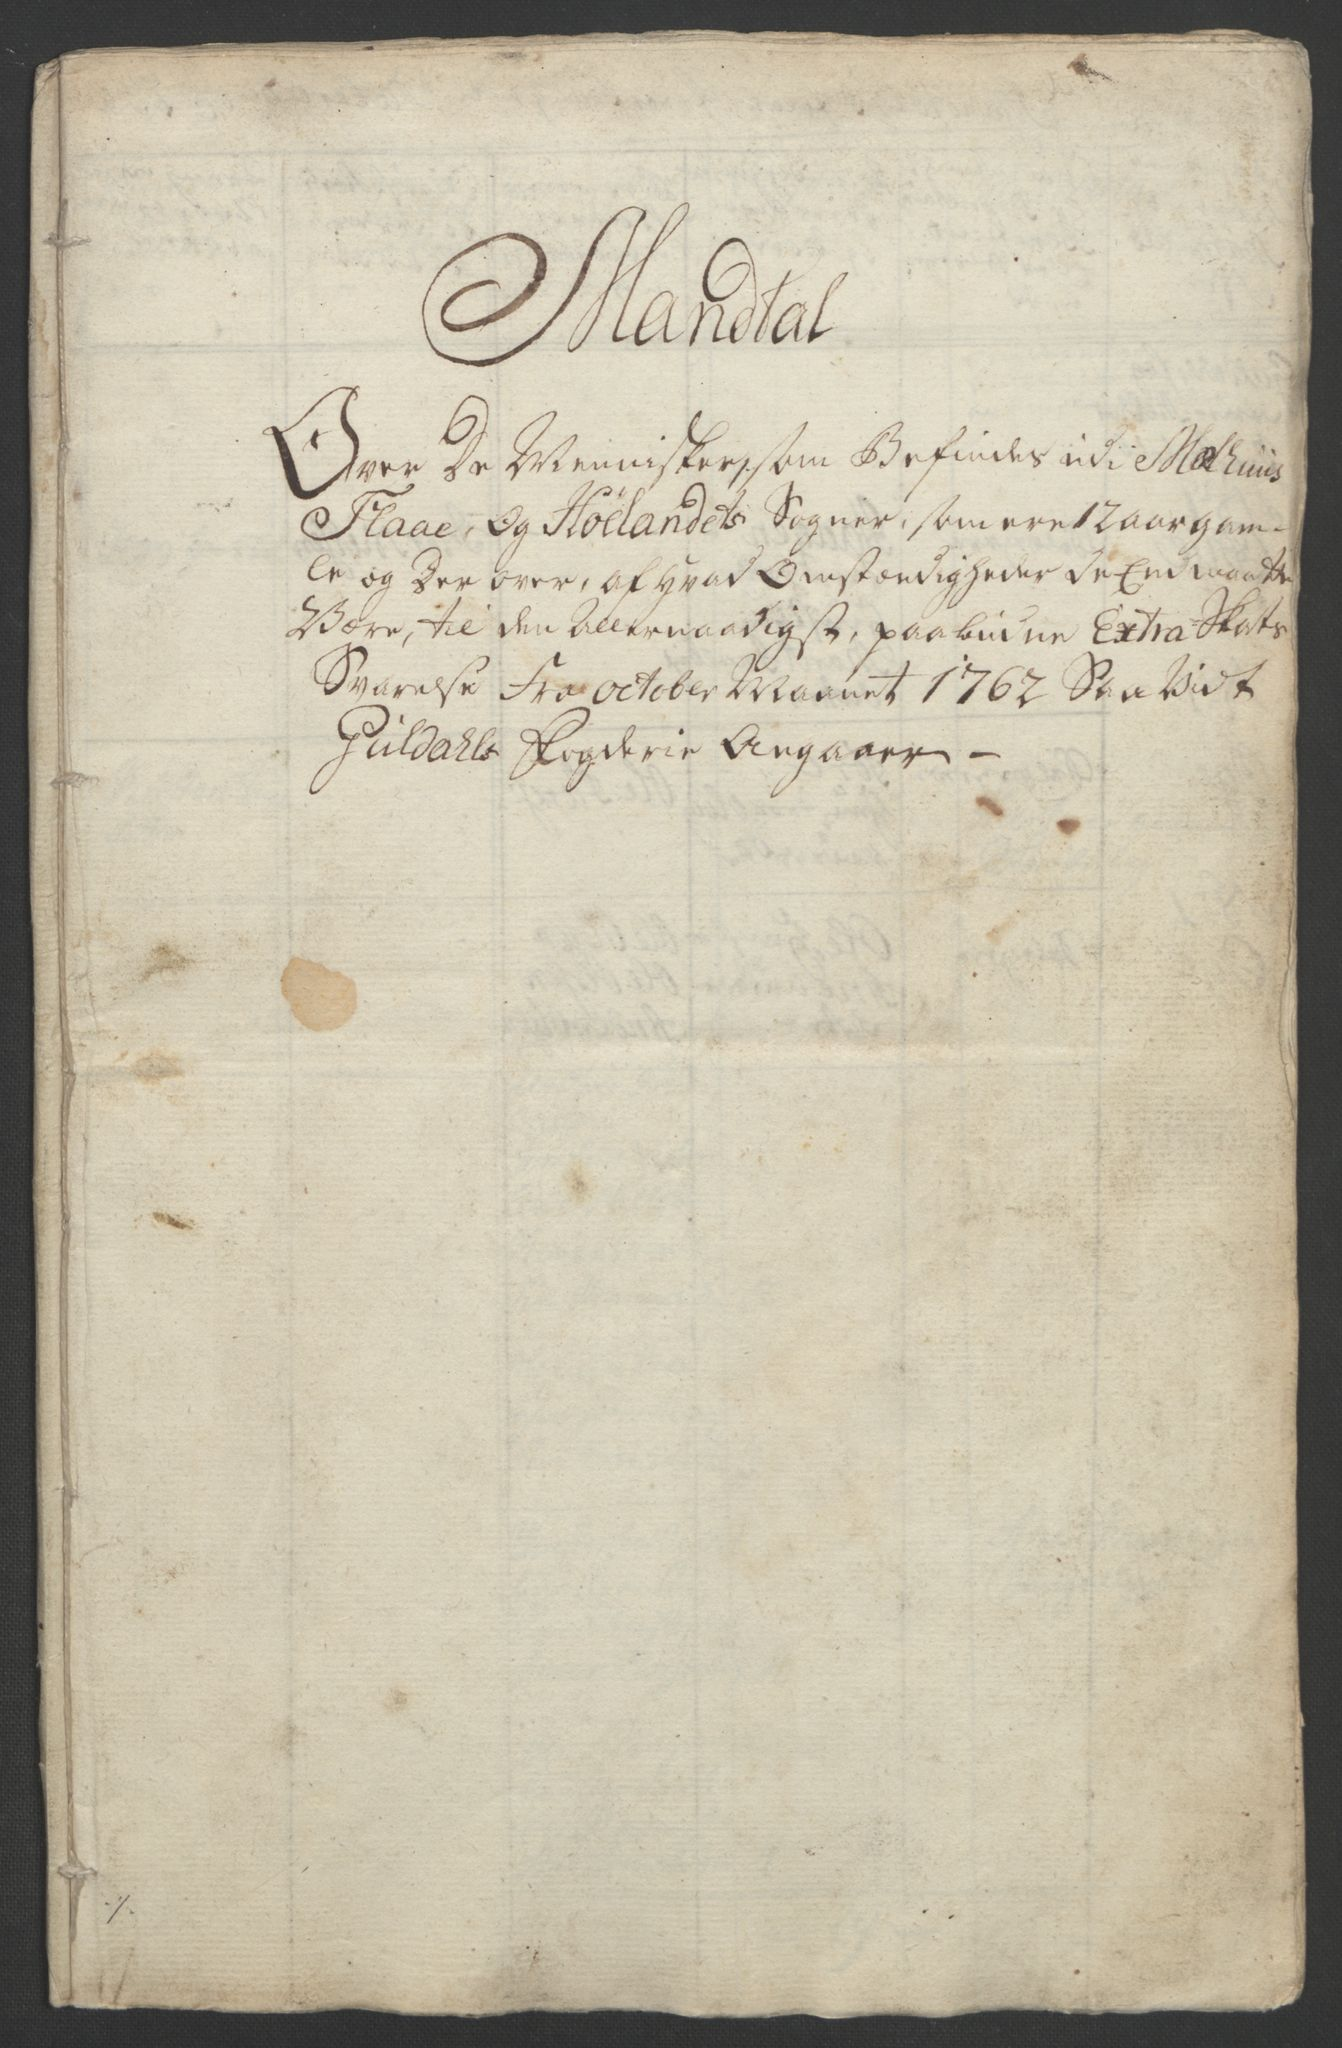 RA, Rentekammeret inntil 1814, Realistisk ordnet avdeling, Ol/L0021: [Gg 10]: Ekstraskatten, 23.09.1762. Orkdal og Gauldal, 1762-1767, s. 207